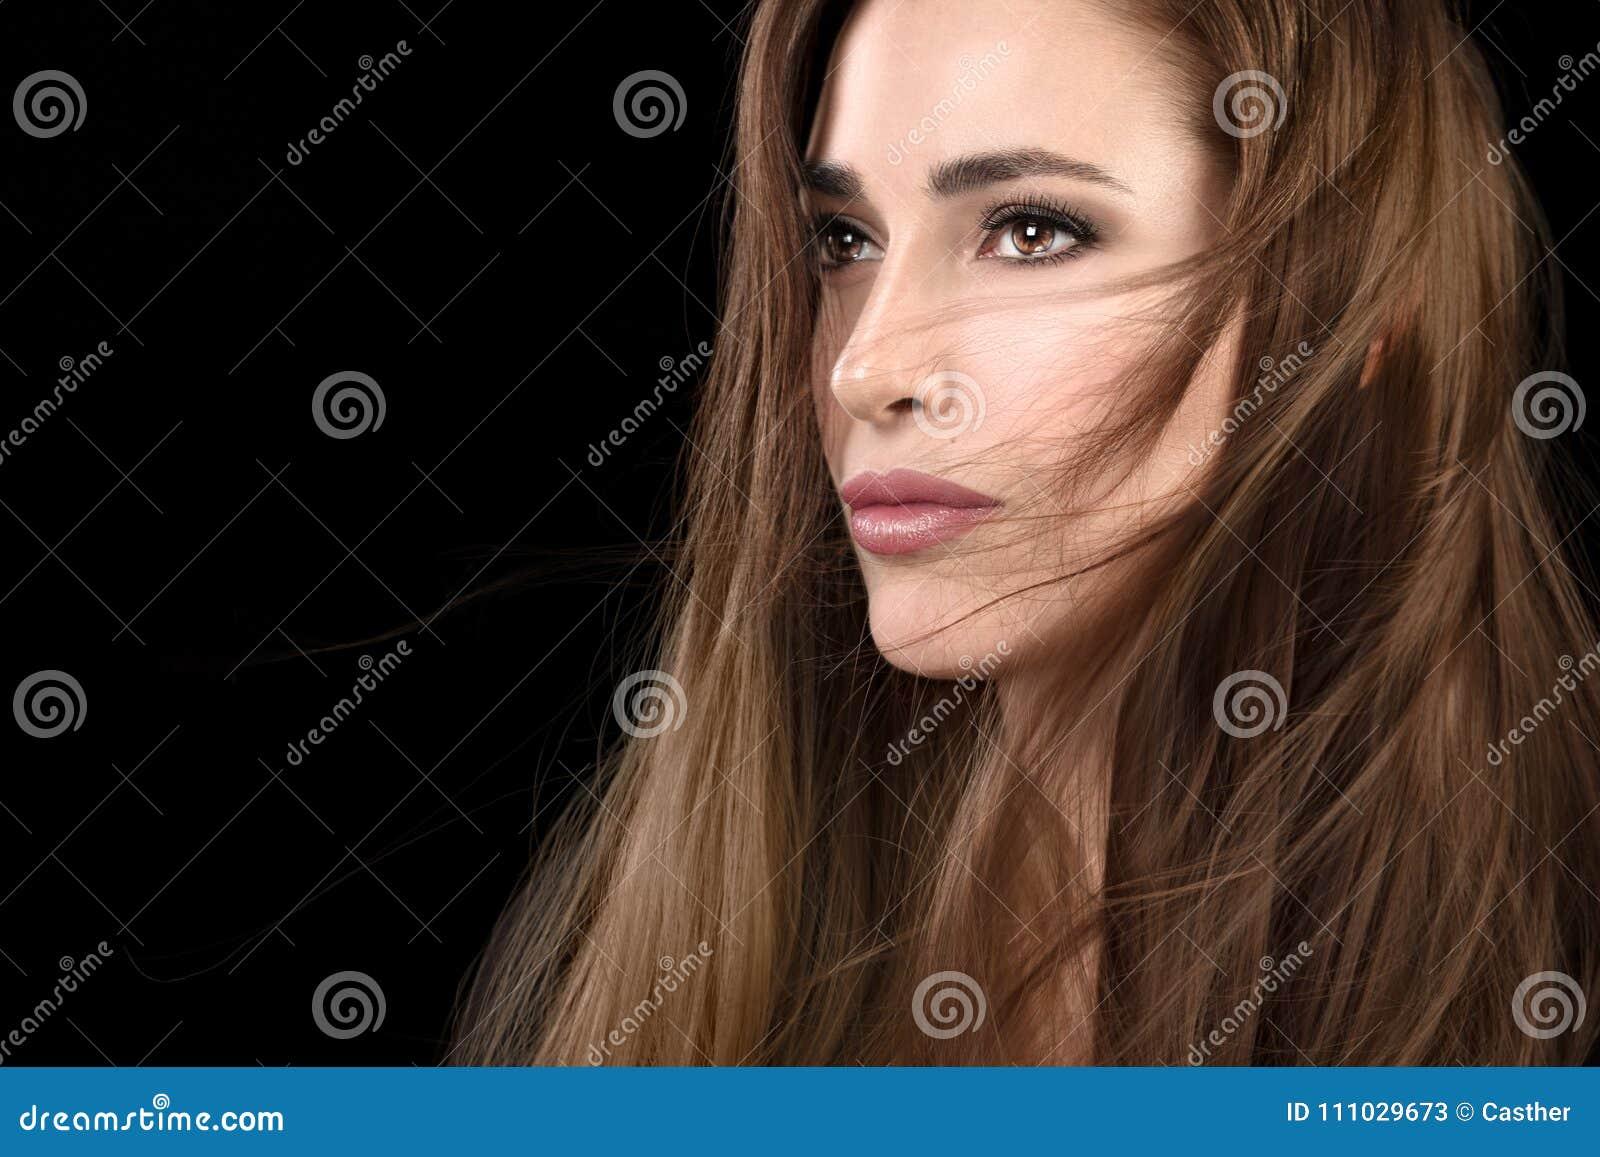 Belle Fille Modele Avec La Coiffure Ebouriffee Image Stock Image